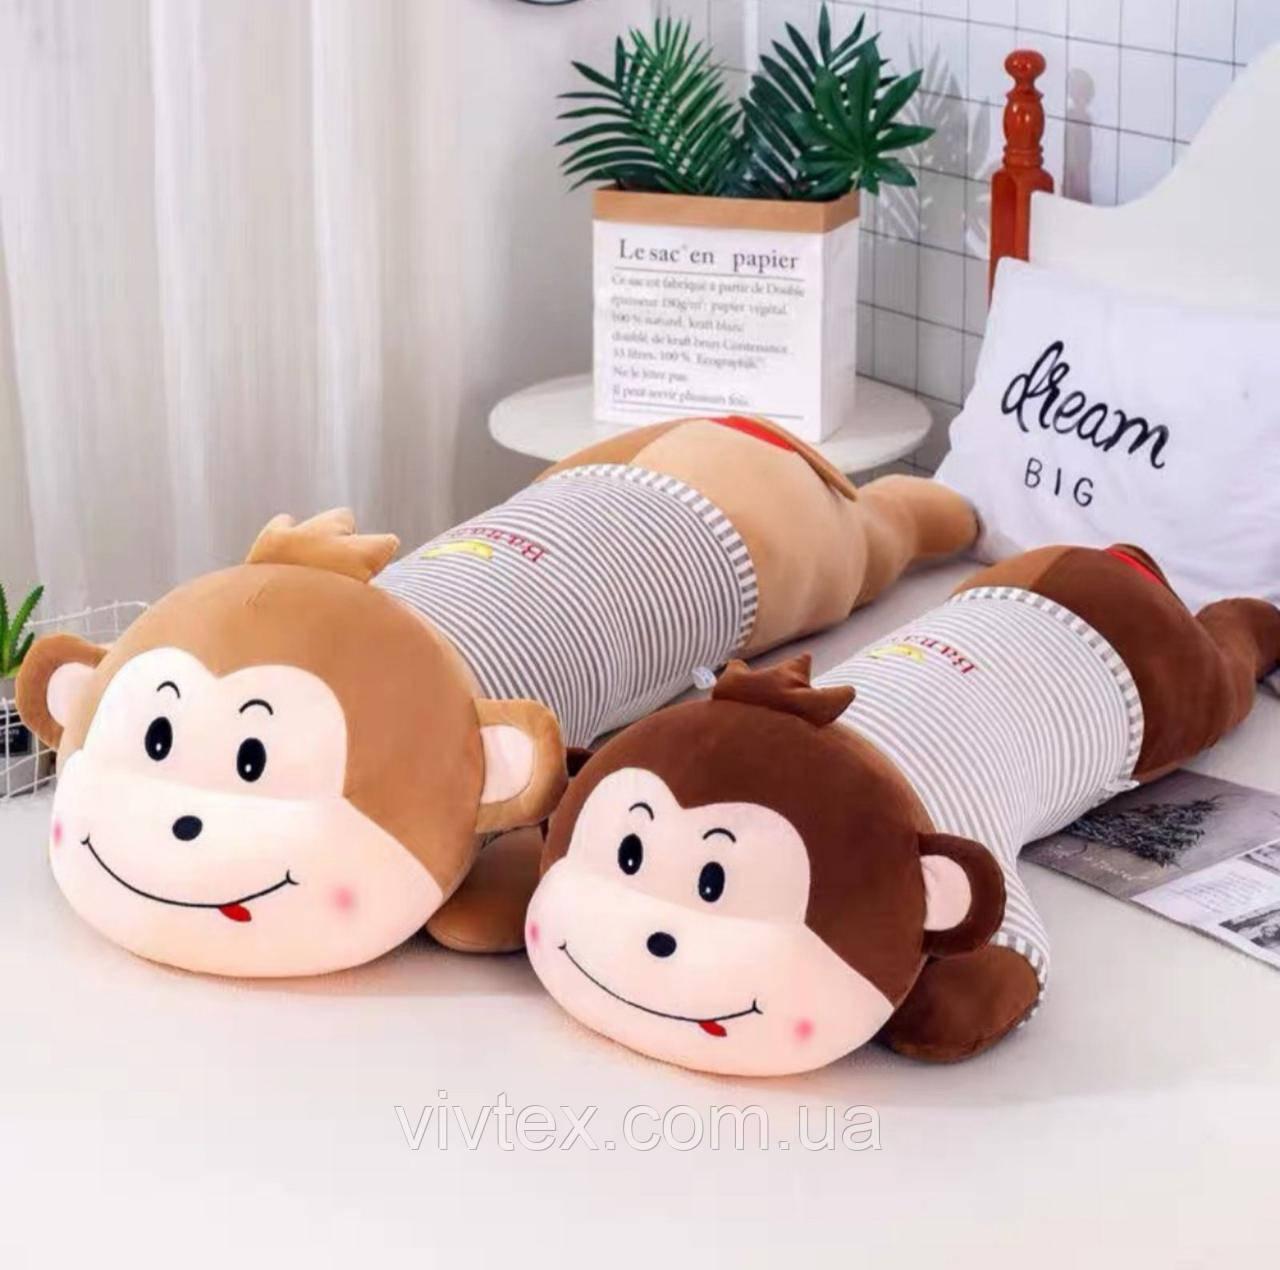 Плед детский + игрушка обезьянка и подушка 3в1 оптом